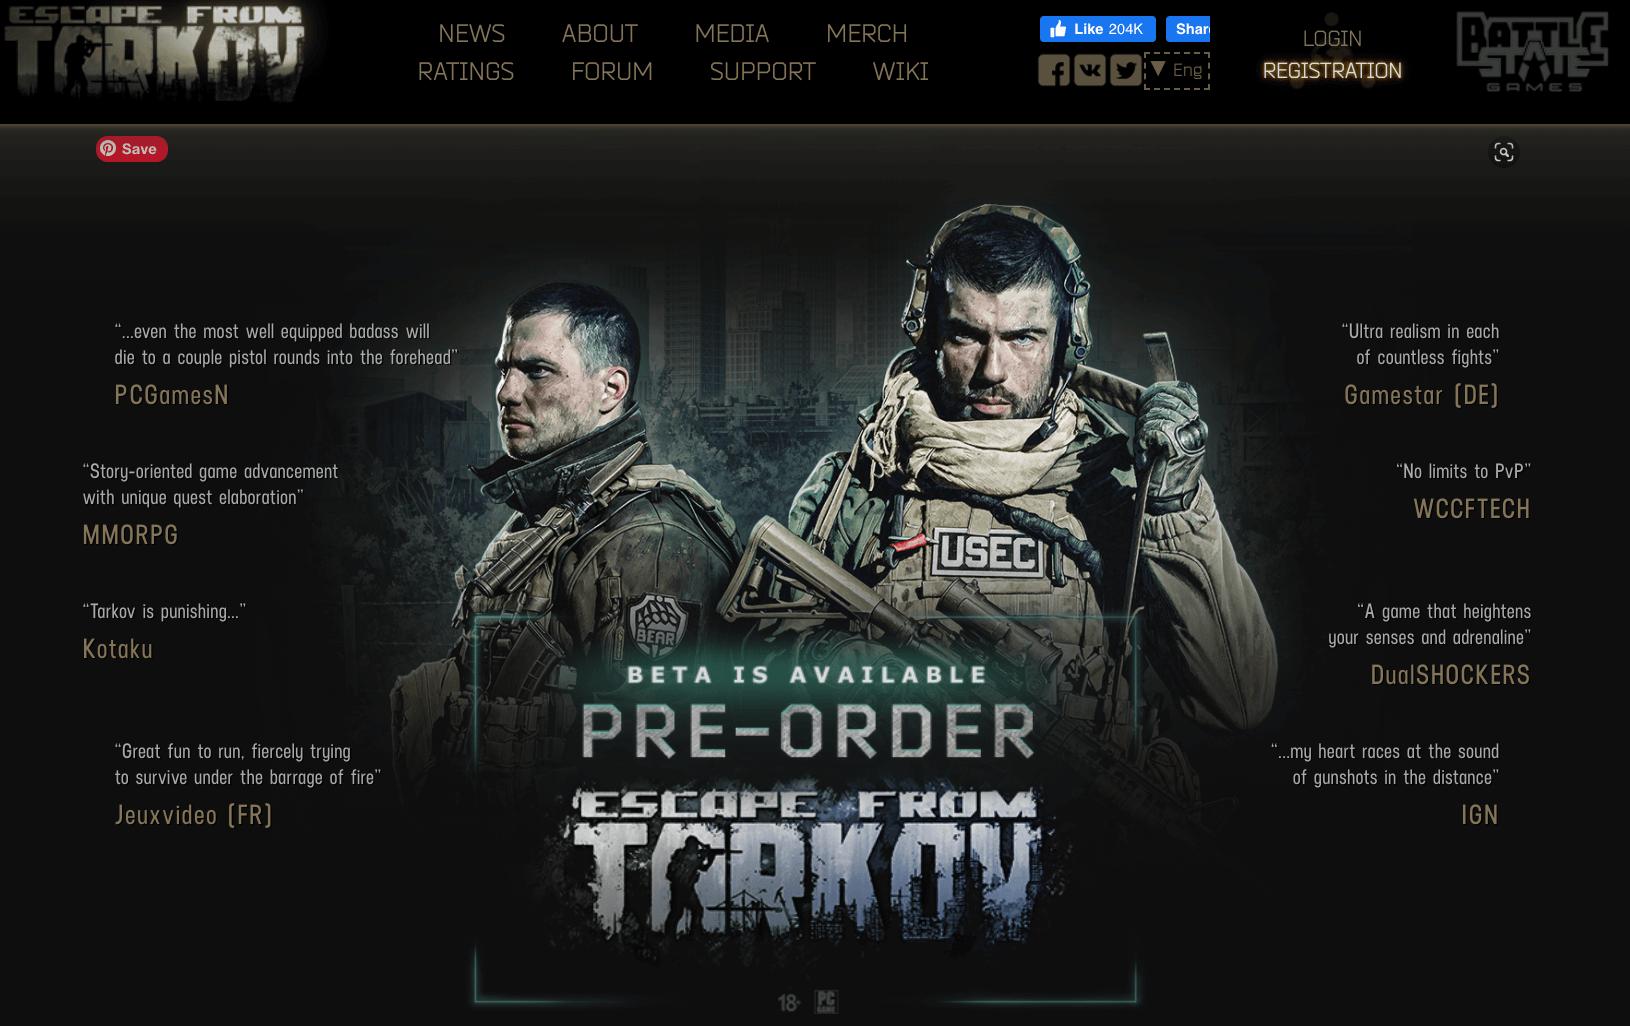 Escape from tarkov website